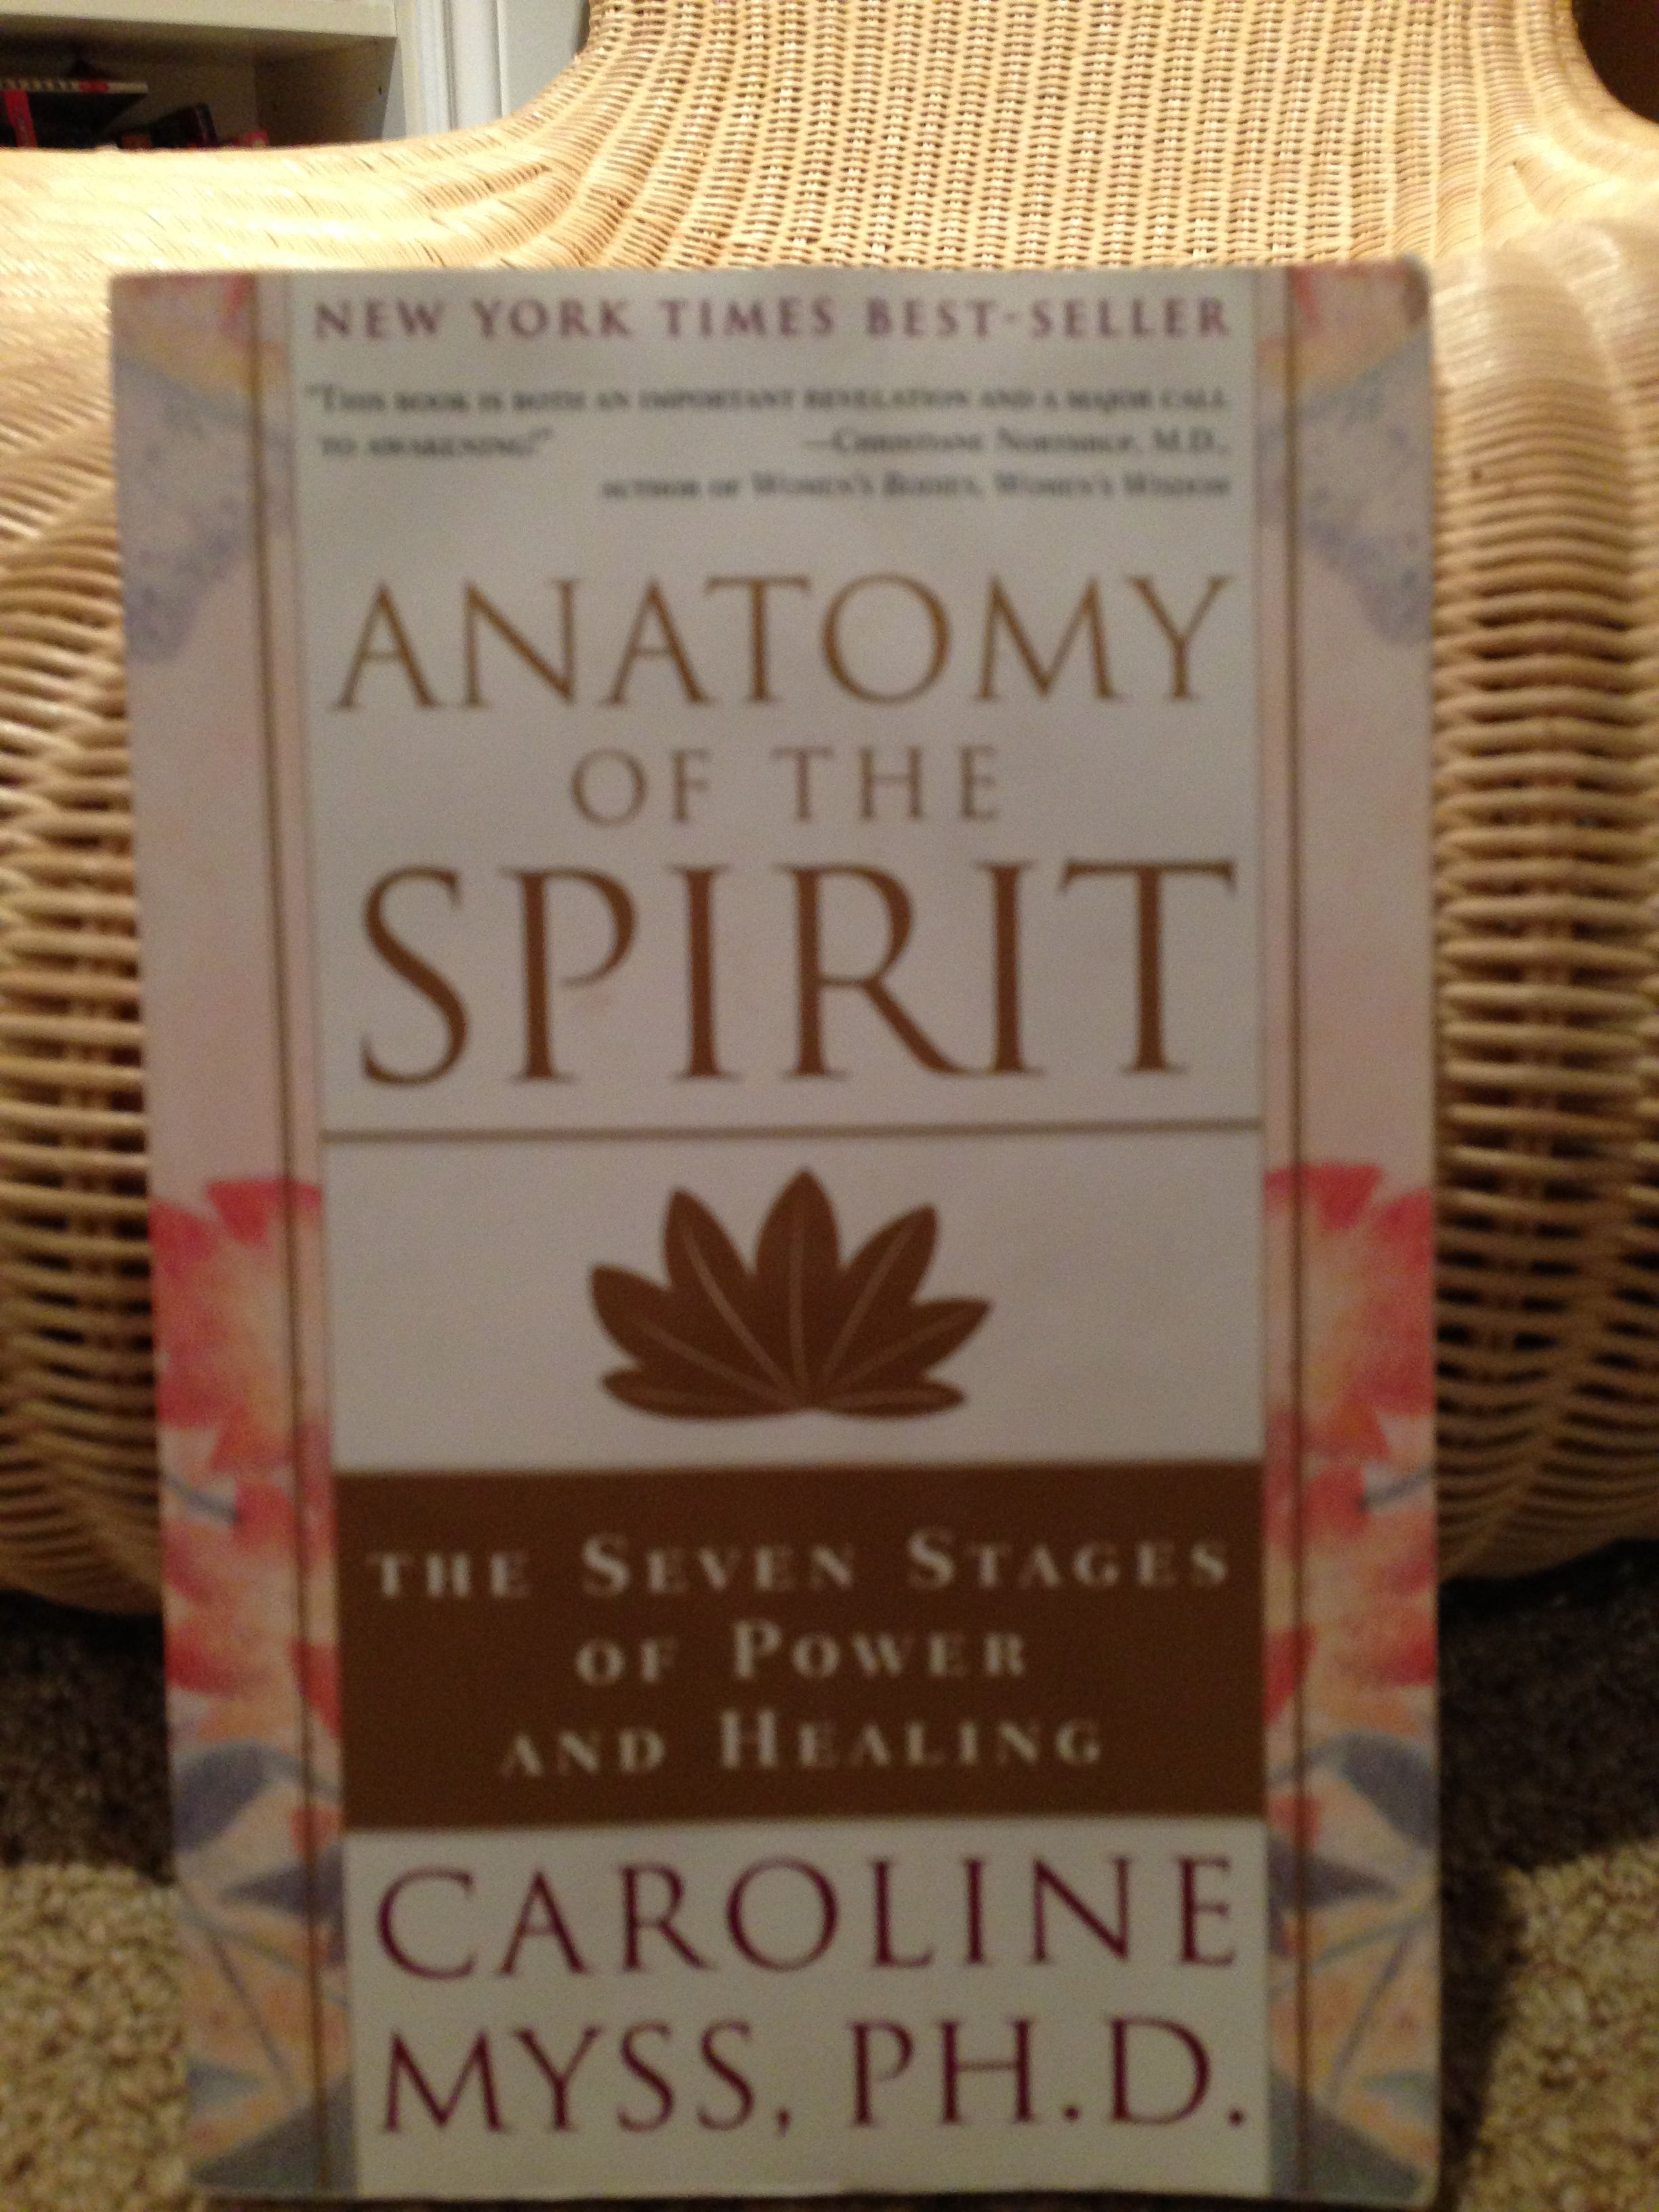 Books I Love Anatomy Of The Spirit A Beautiful Guide To Spiritual